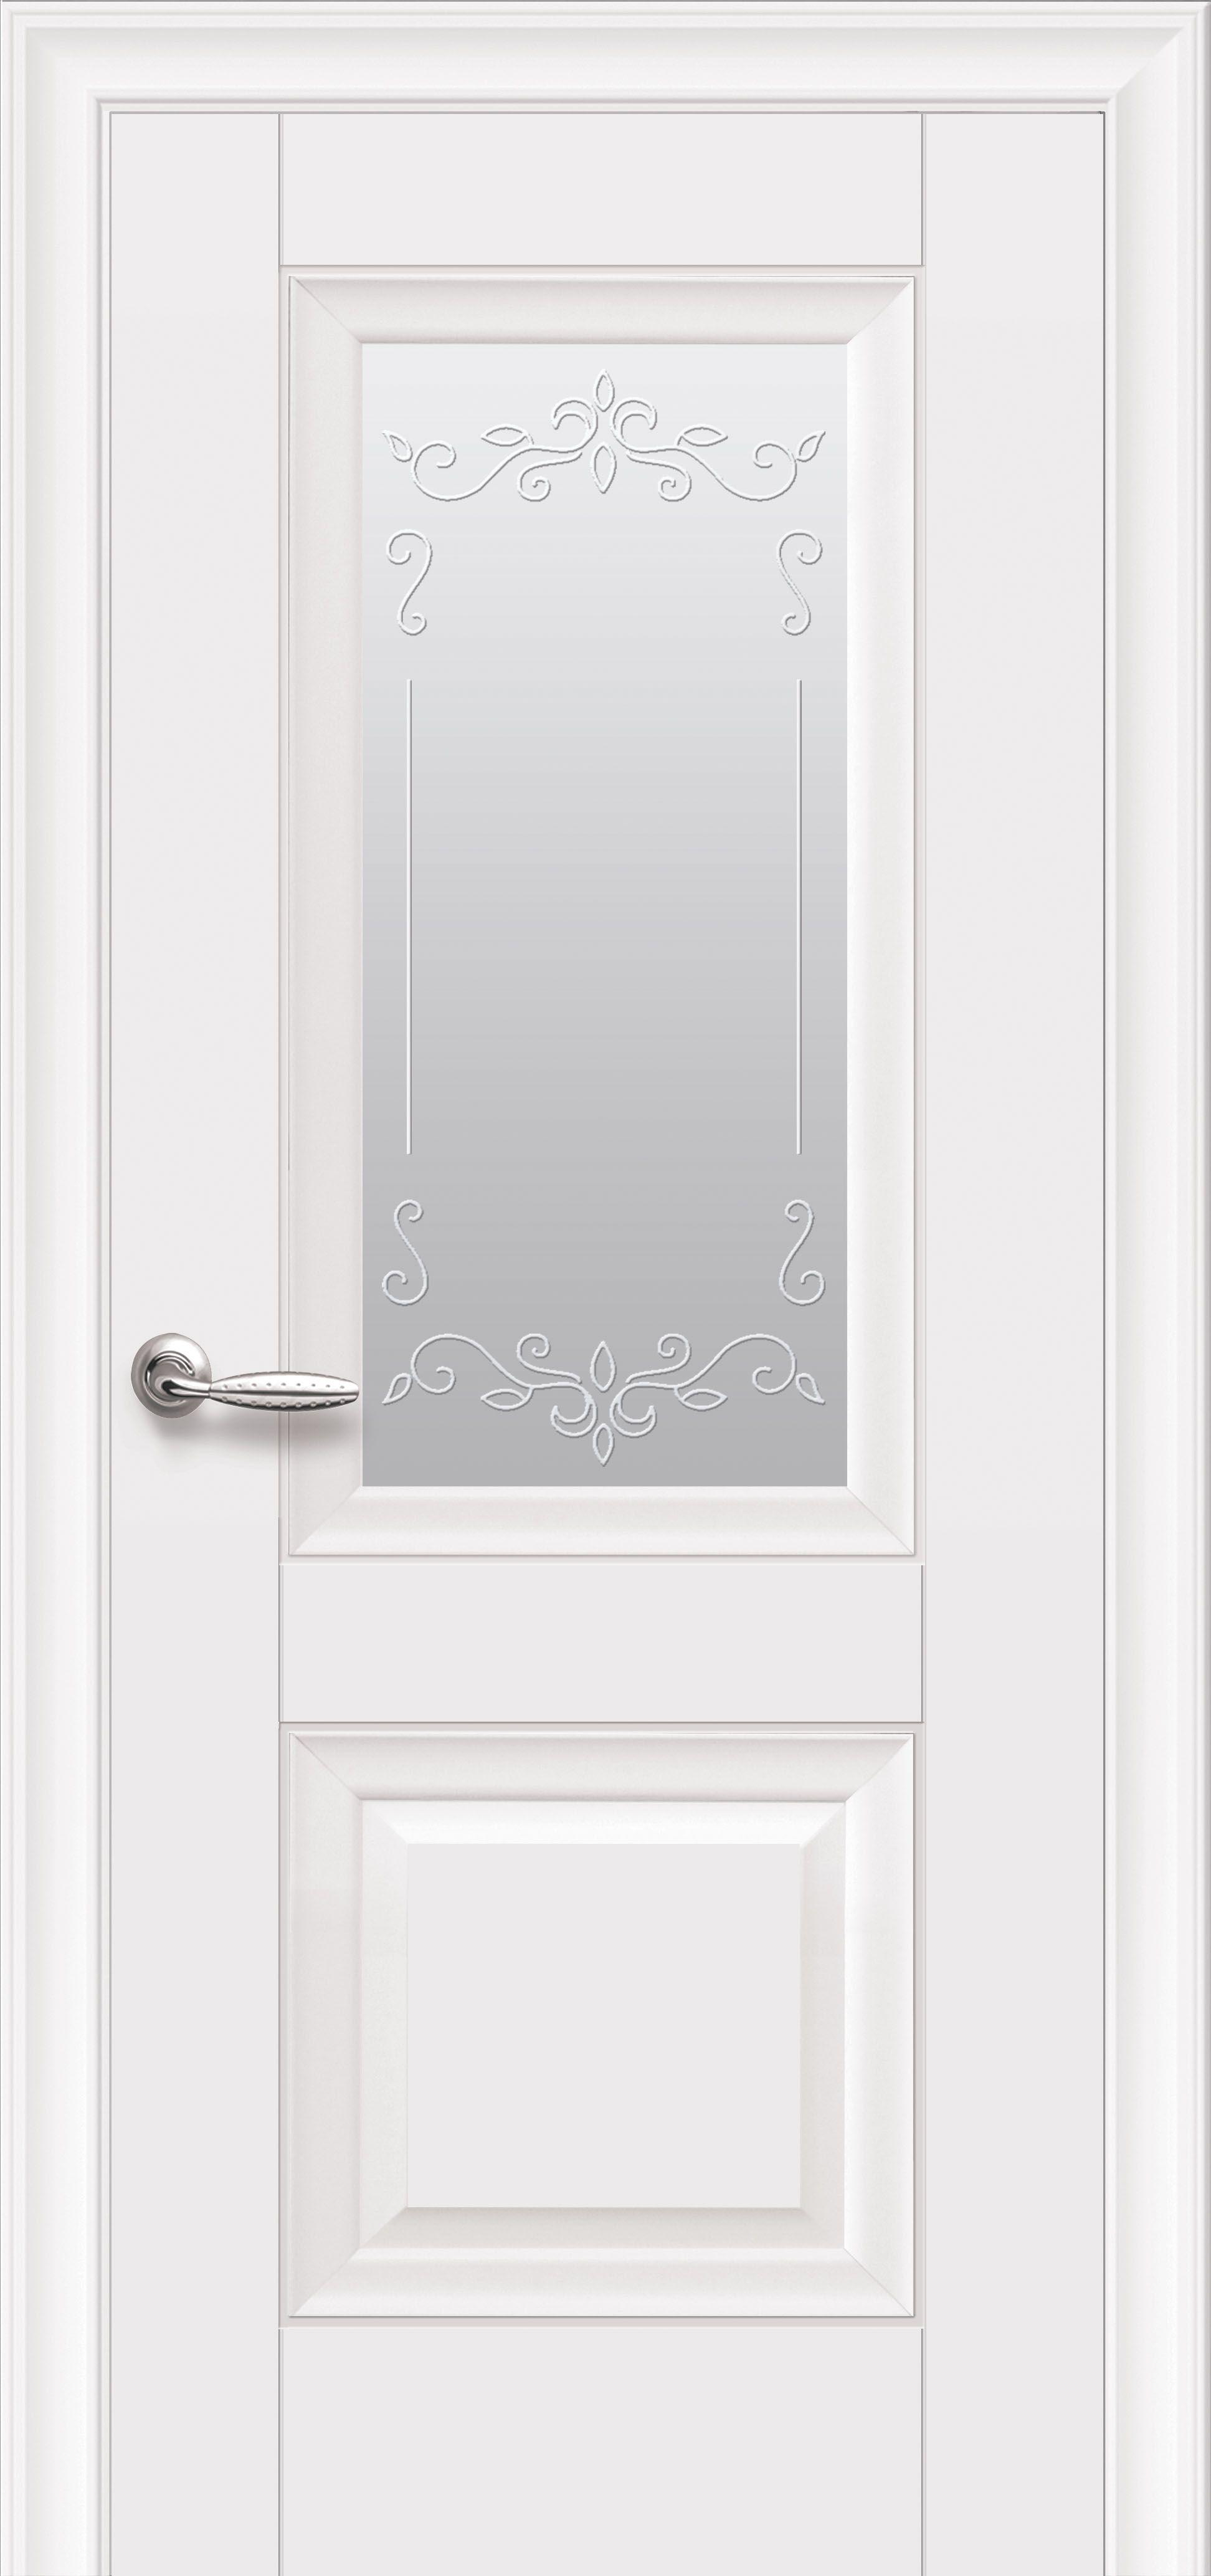 Межкомнатные двери Image без молдинга со стеклом сатин и рисунком